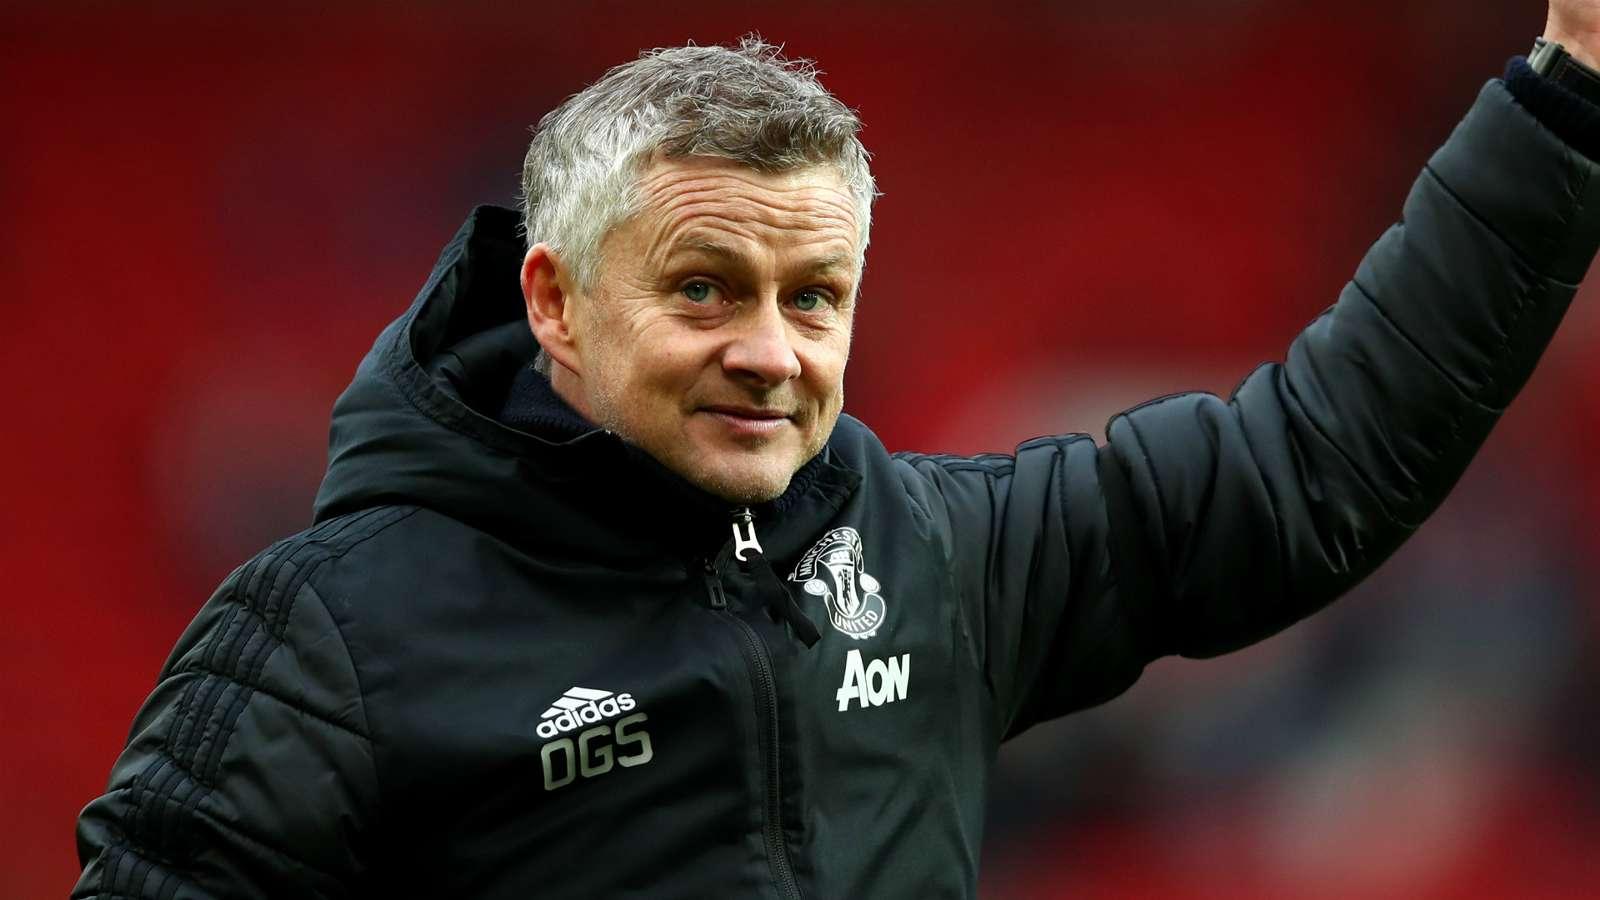 'Solskjaer has been unbelievable' - Man Utd stars 'really enjoying' working under Norwegian boss, says Shaw - Bóng Đá